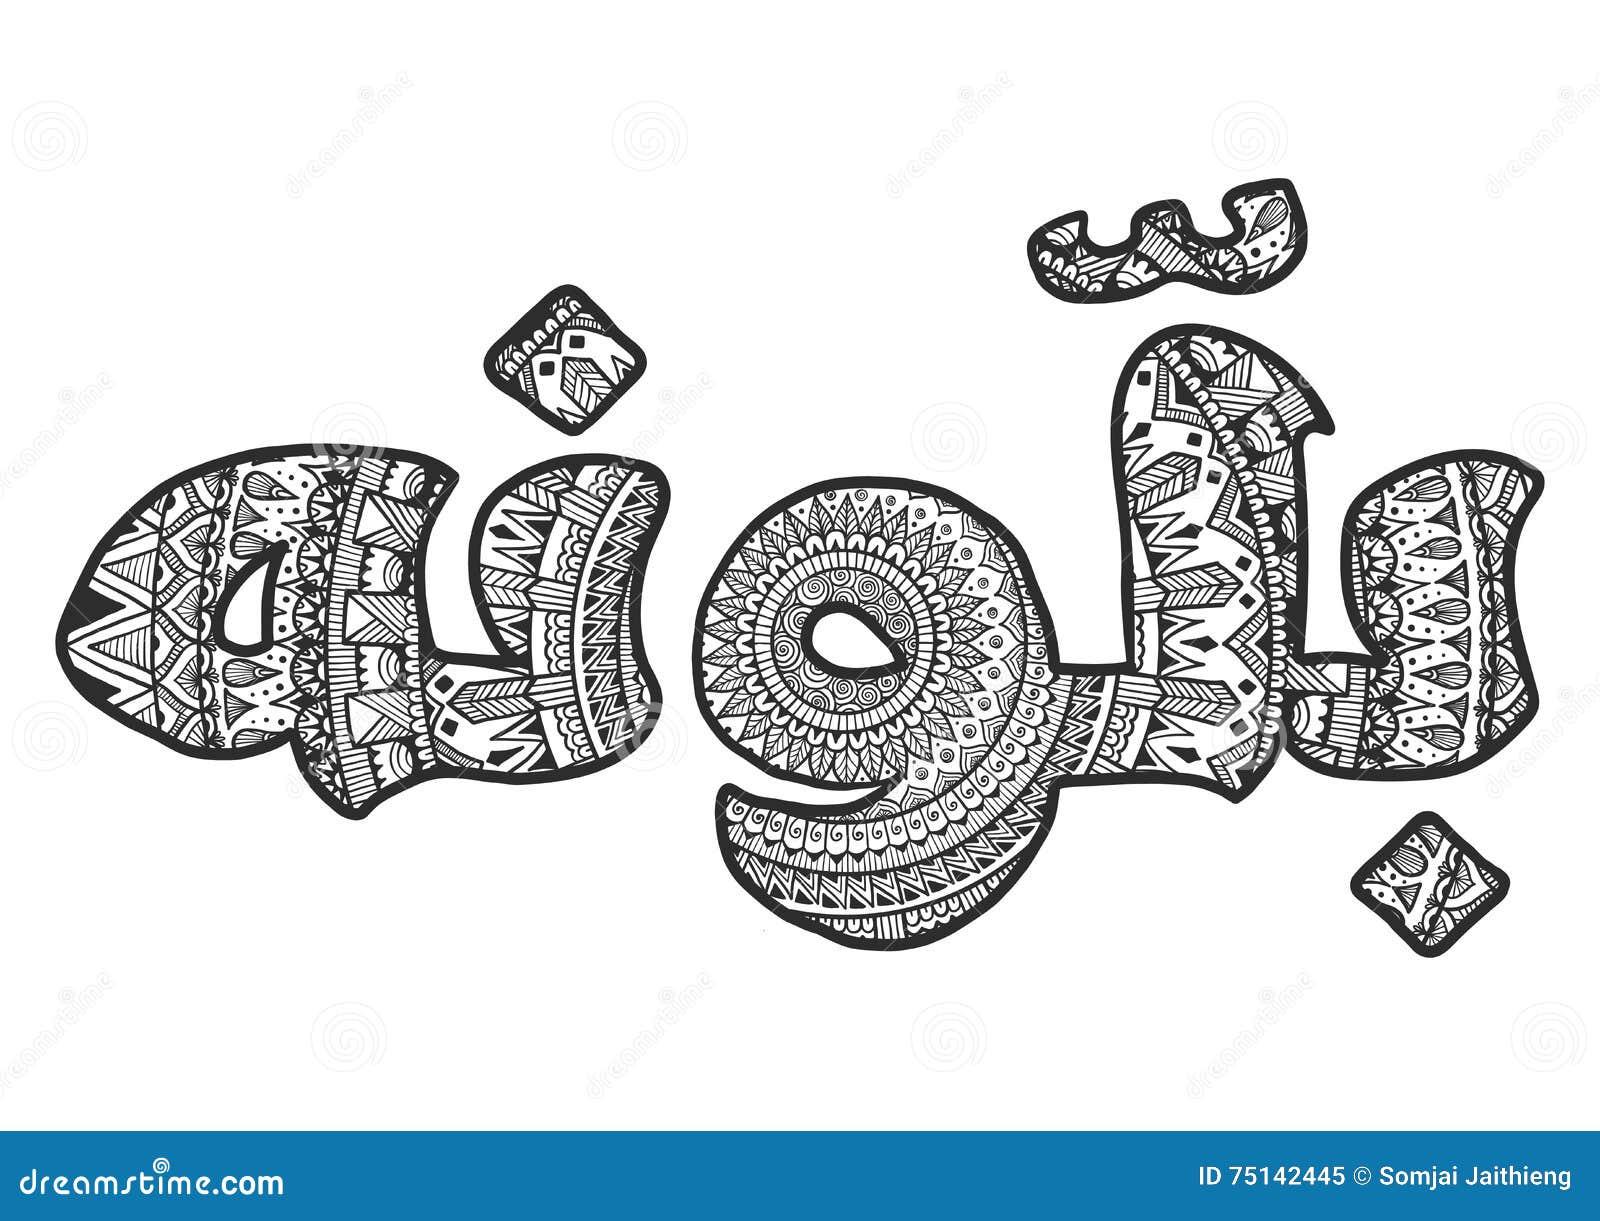 Design t shirt arabic - Zendoodle Design Of Ballouneh Village In Arabic For T Shirt Design Stock Vector